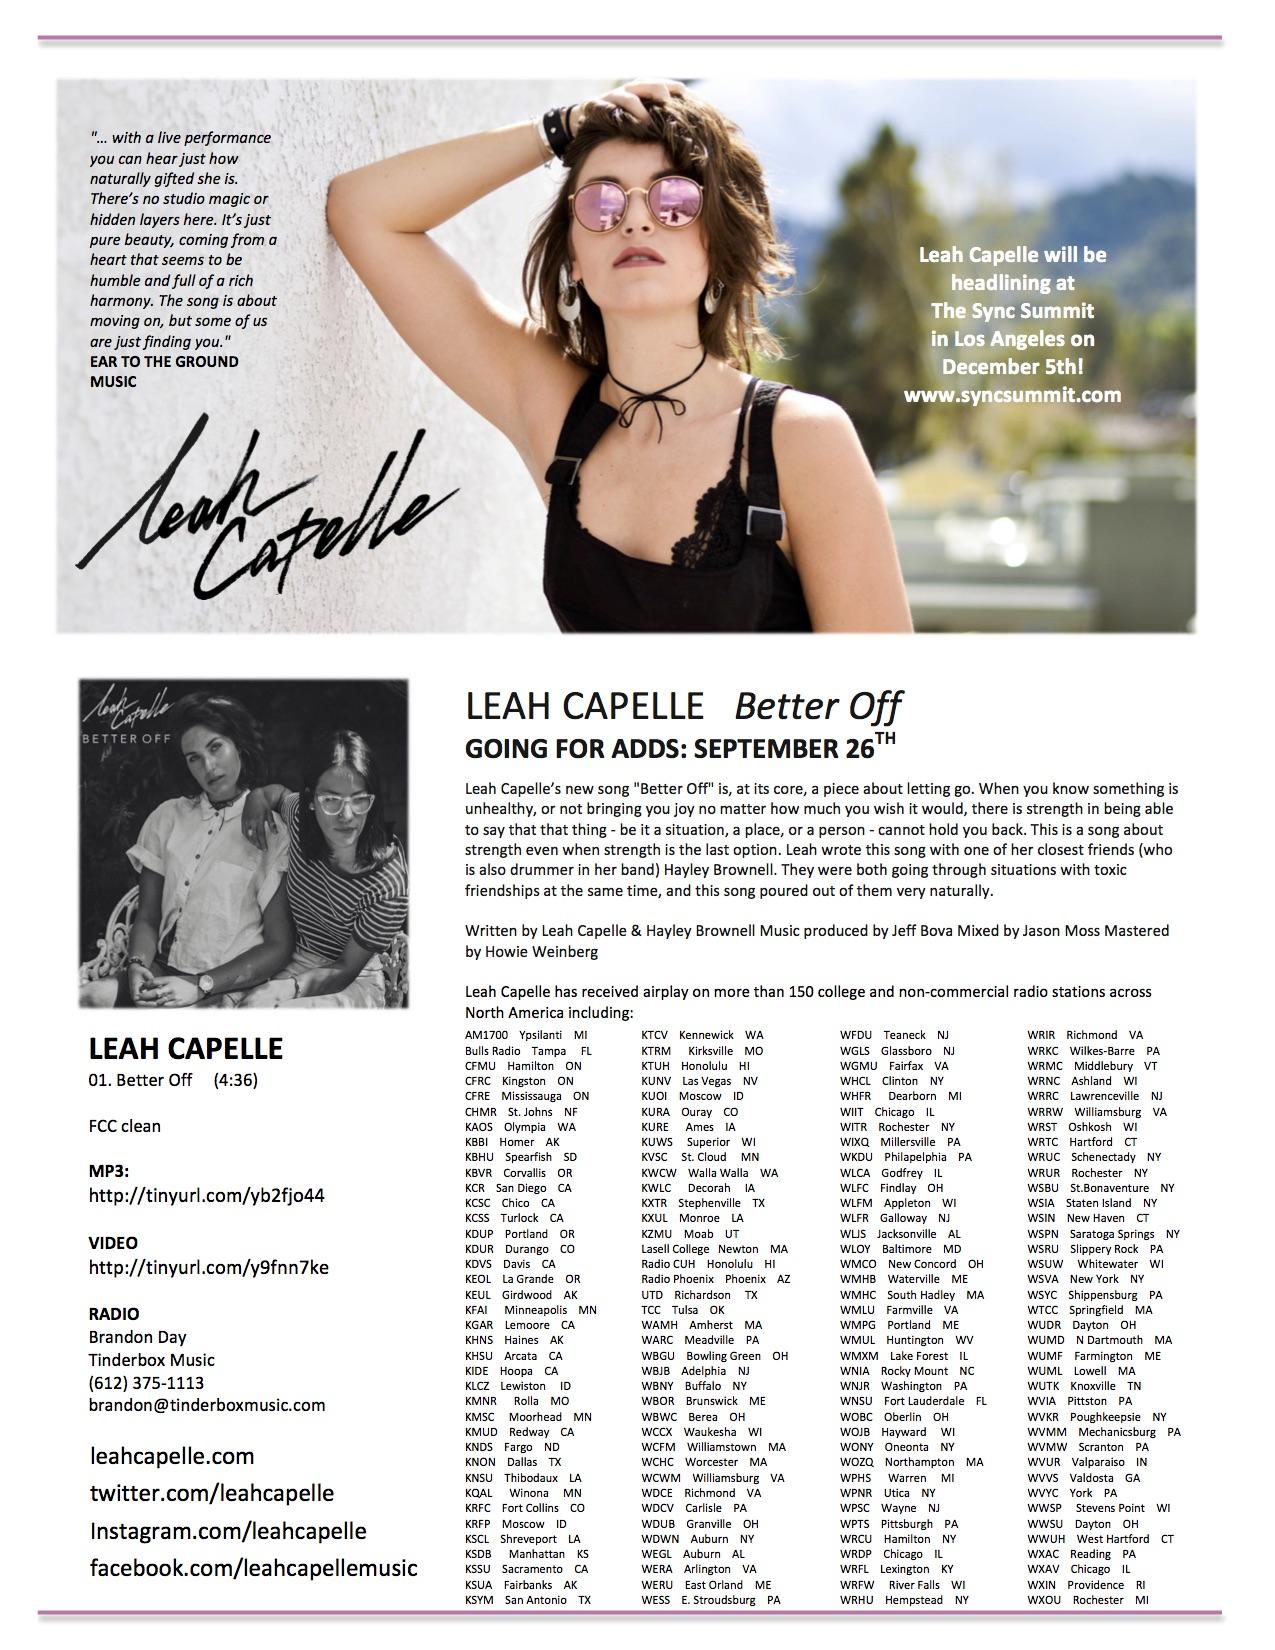 Leah Capelle Better Off onesheet[13].jpg